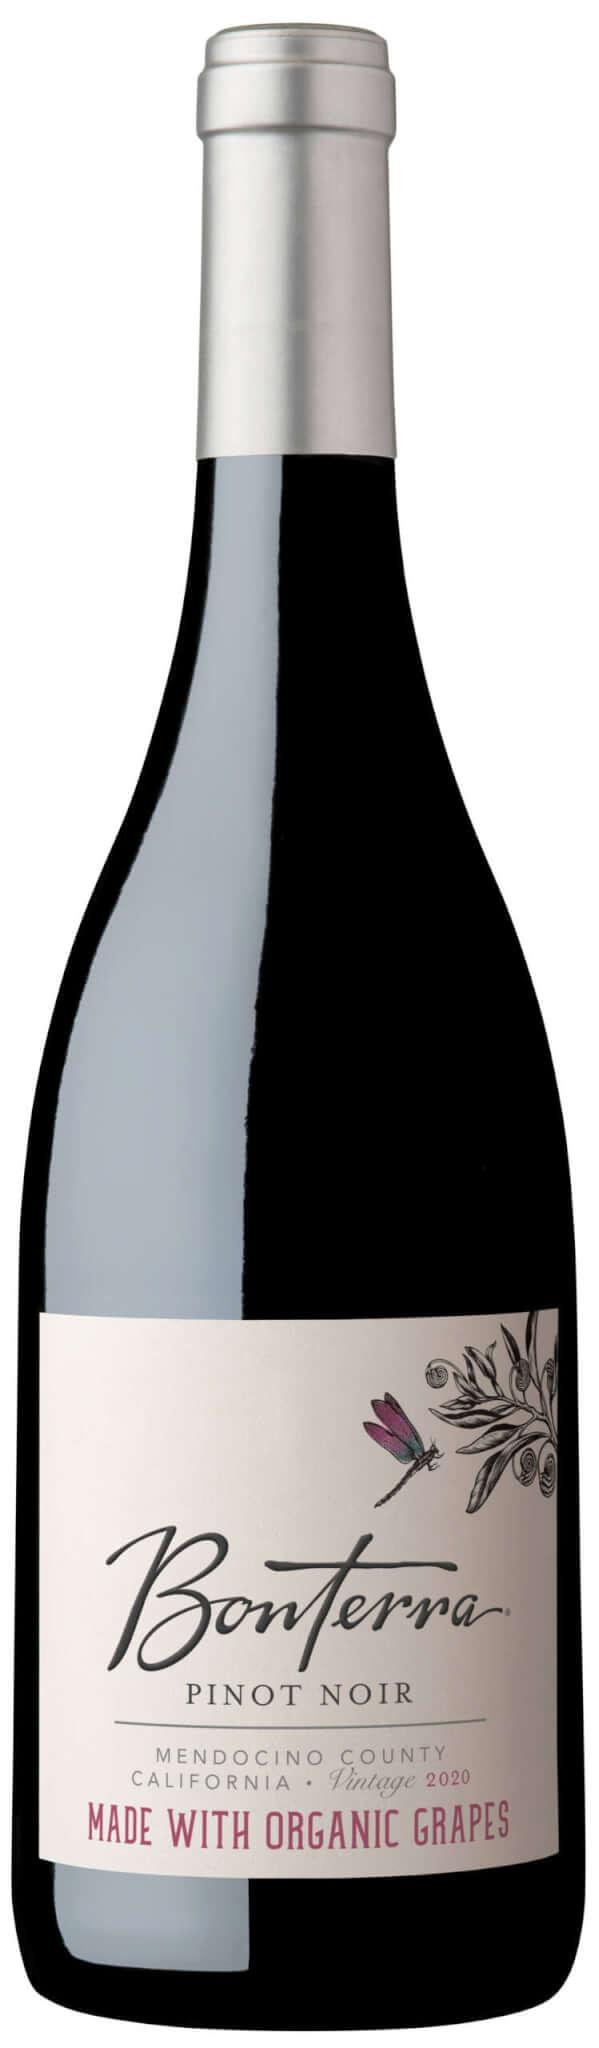 Pinot Noir 2020 bottle image